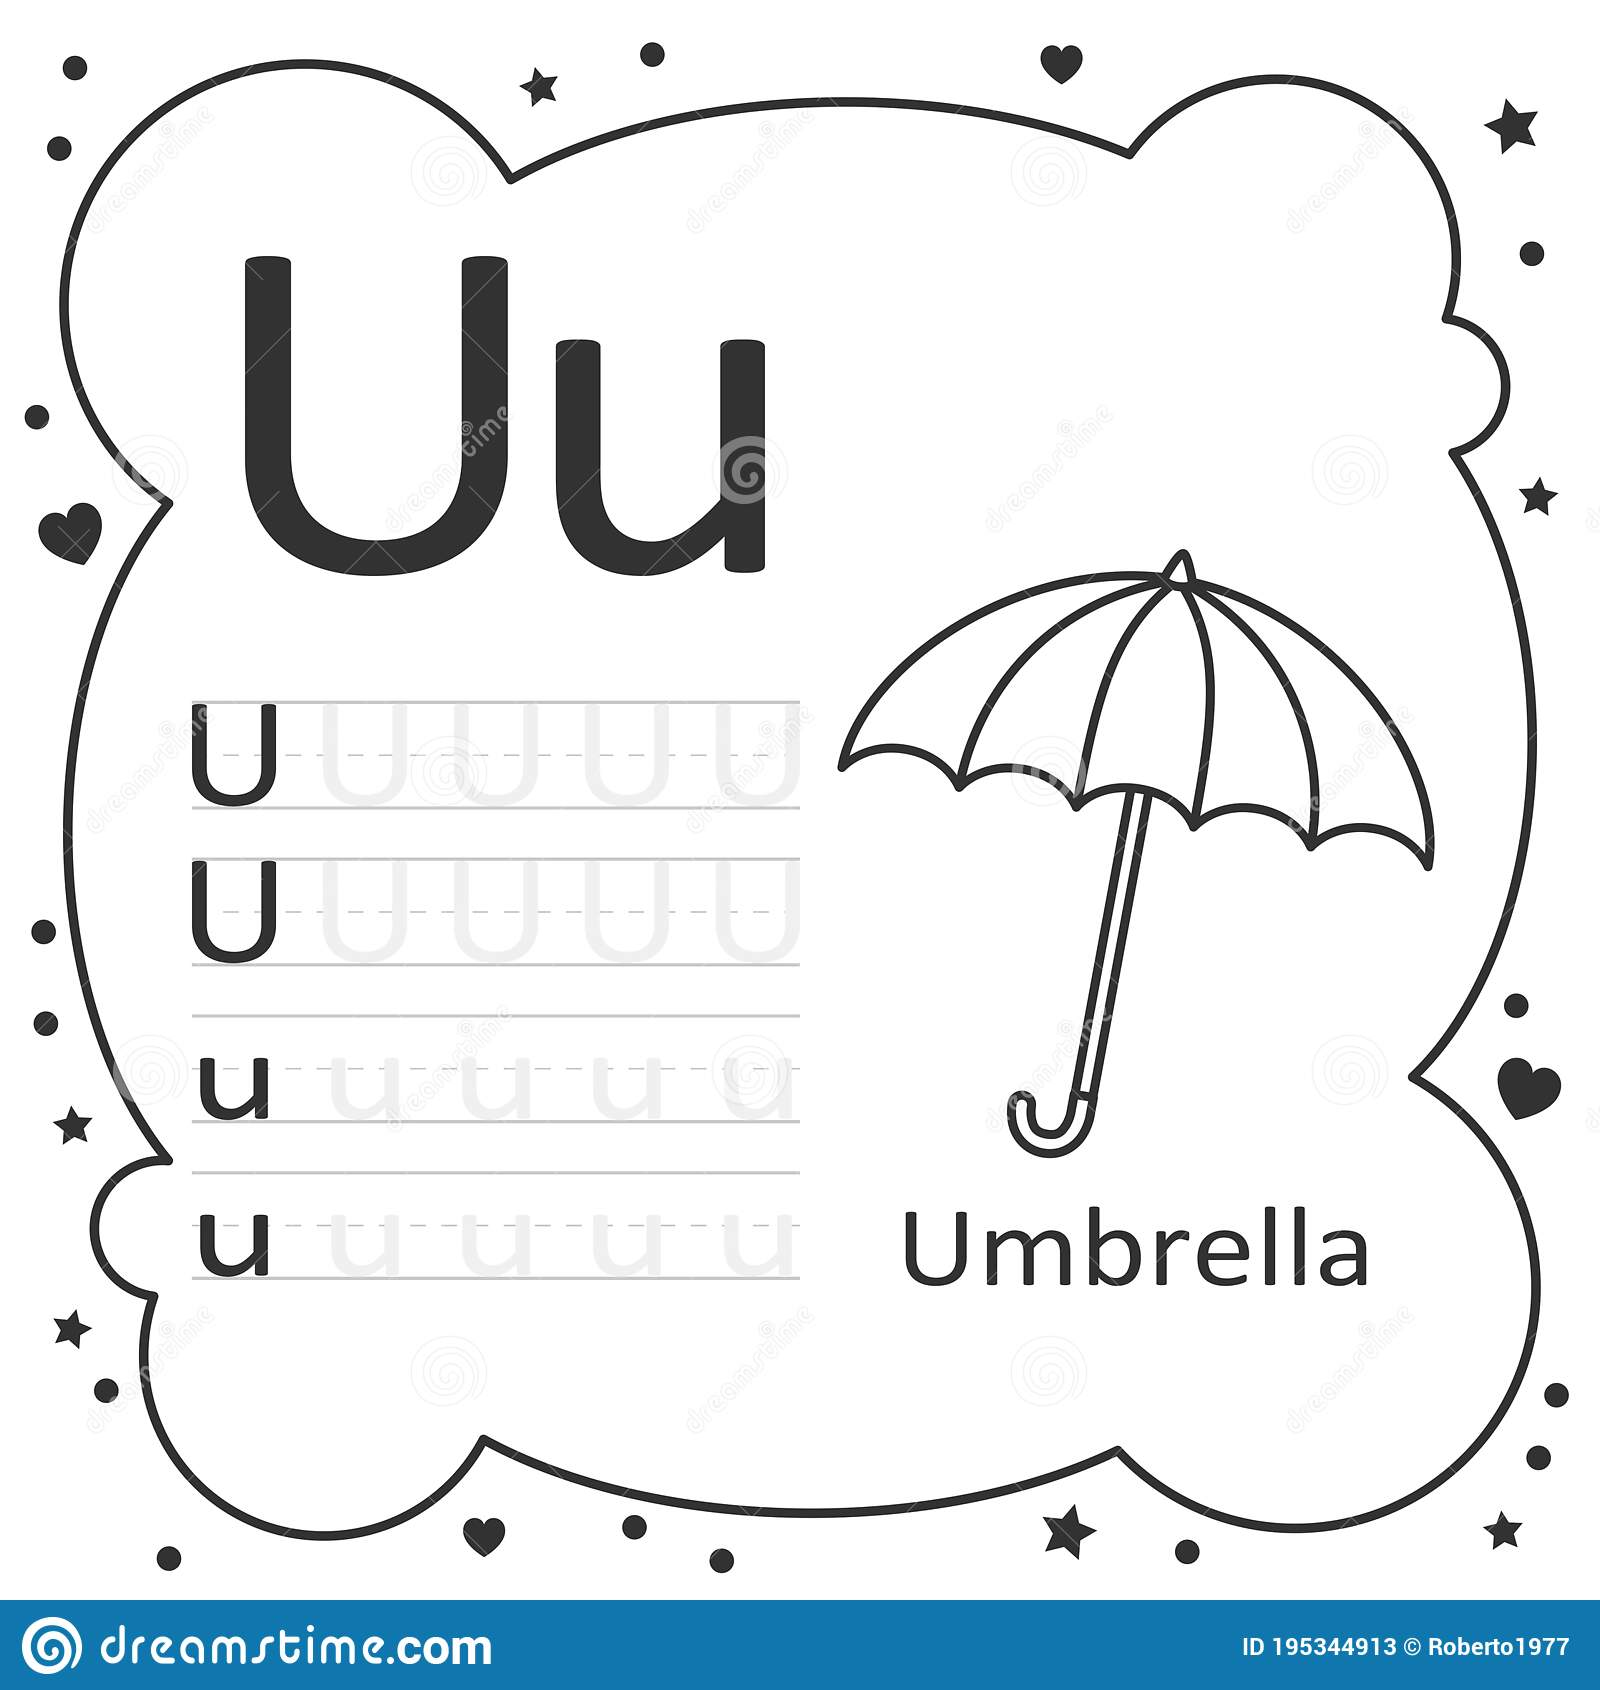 Coloring Alphabet Tracing Letters Umbrella Stock Vector